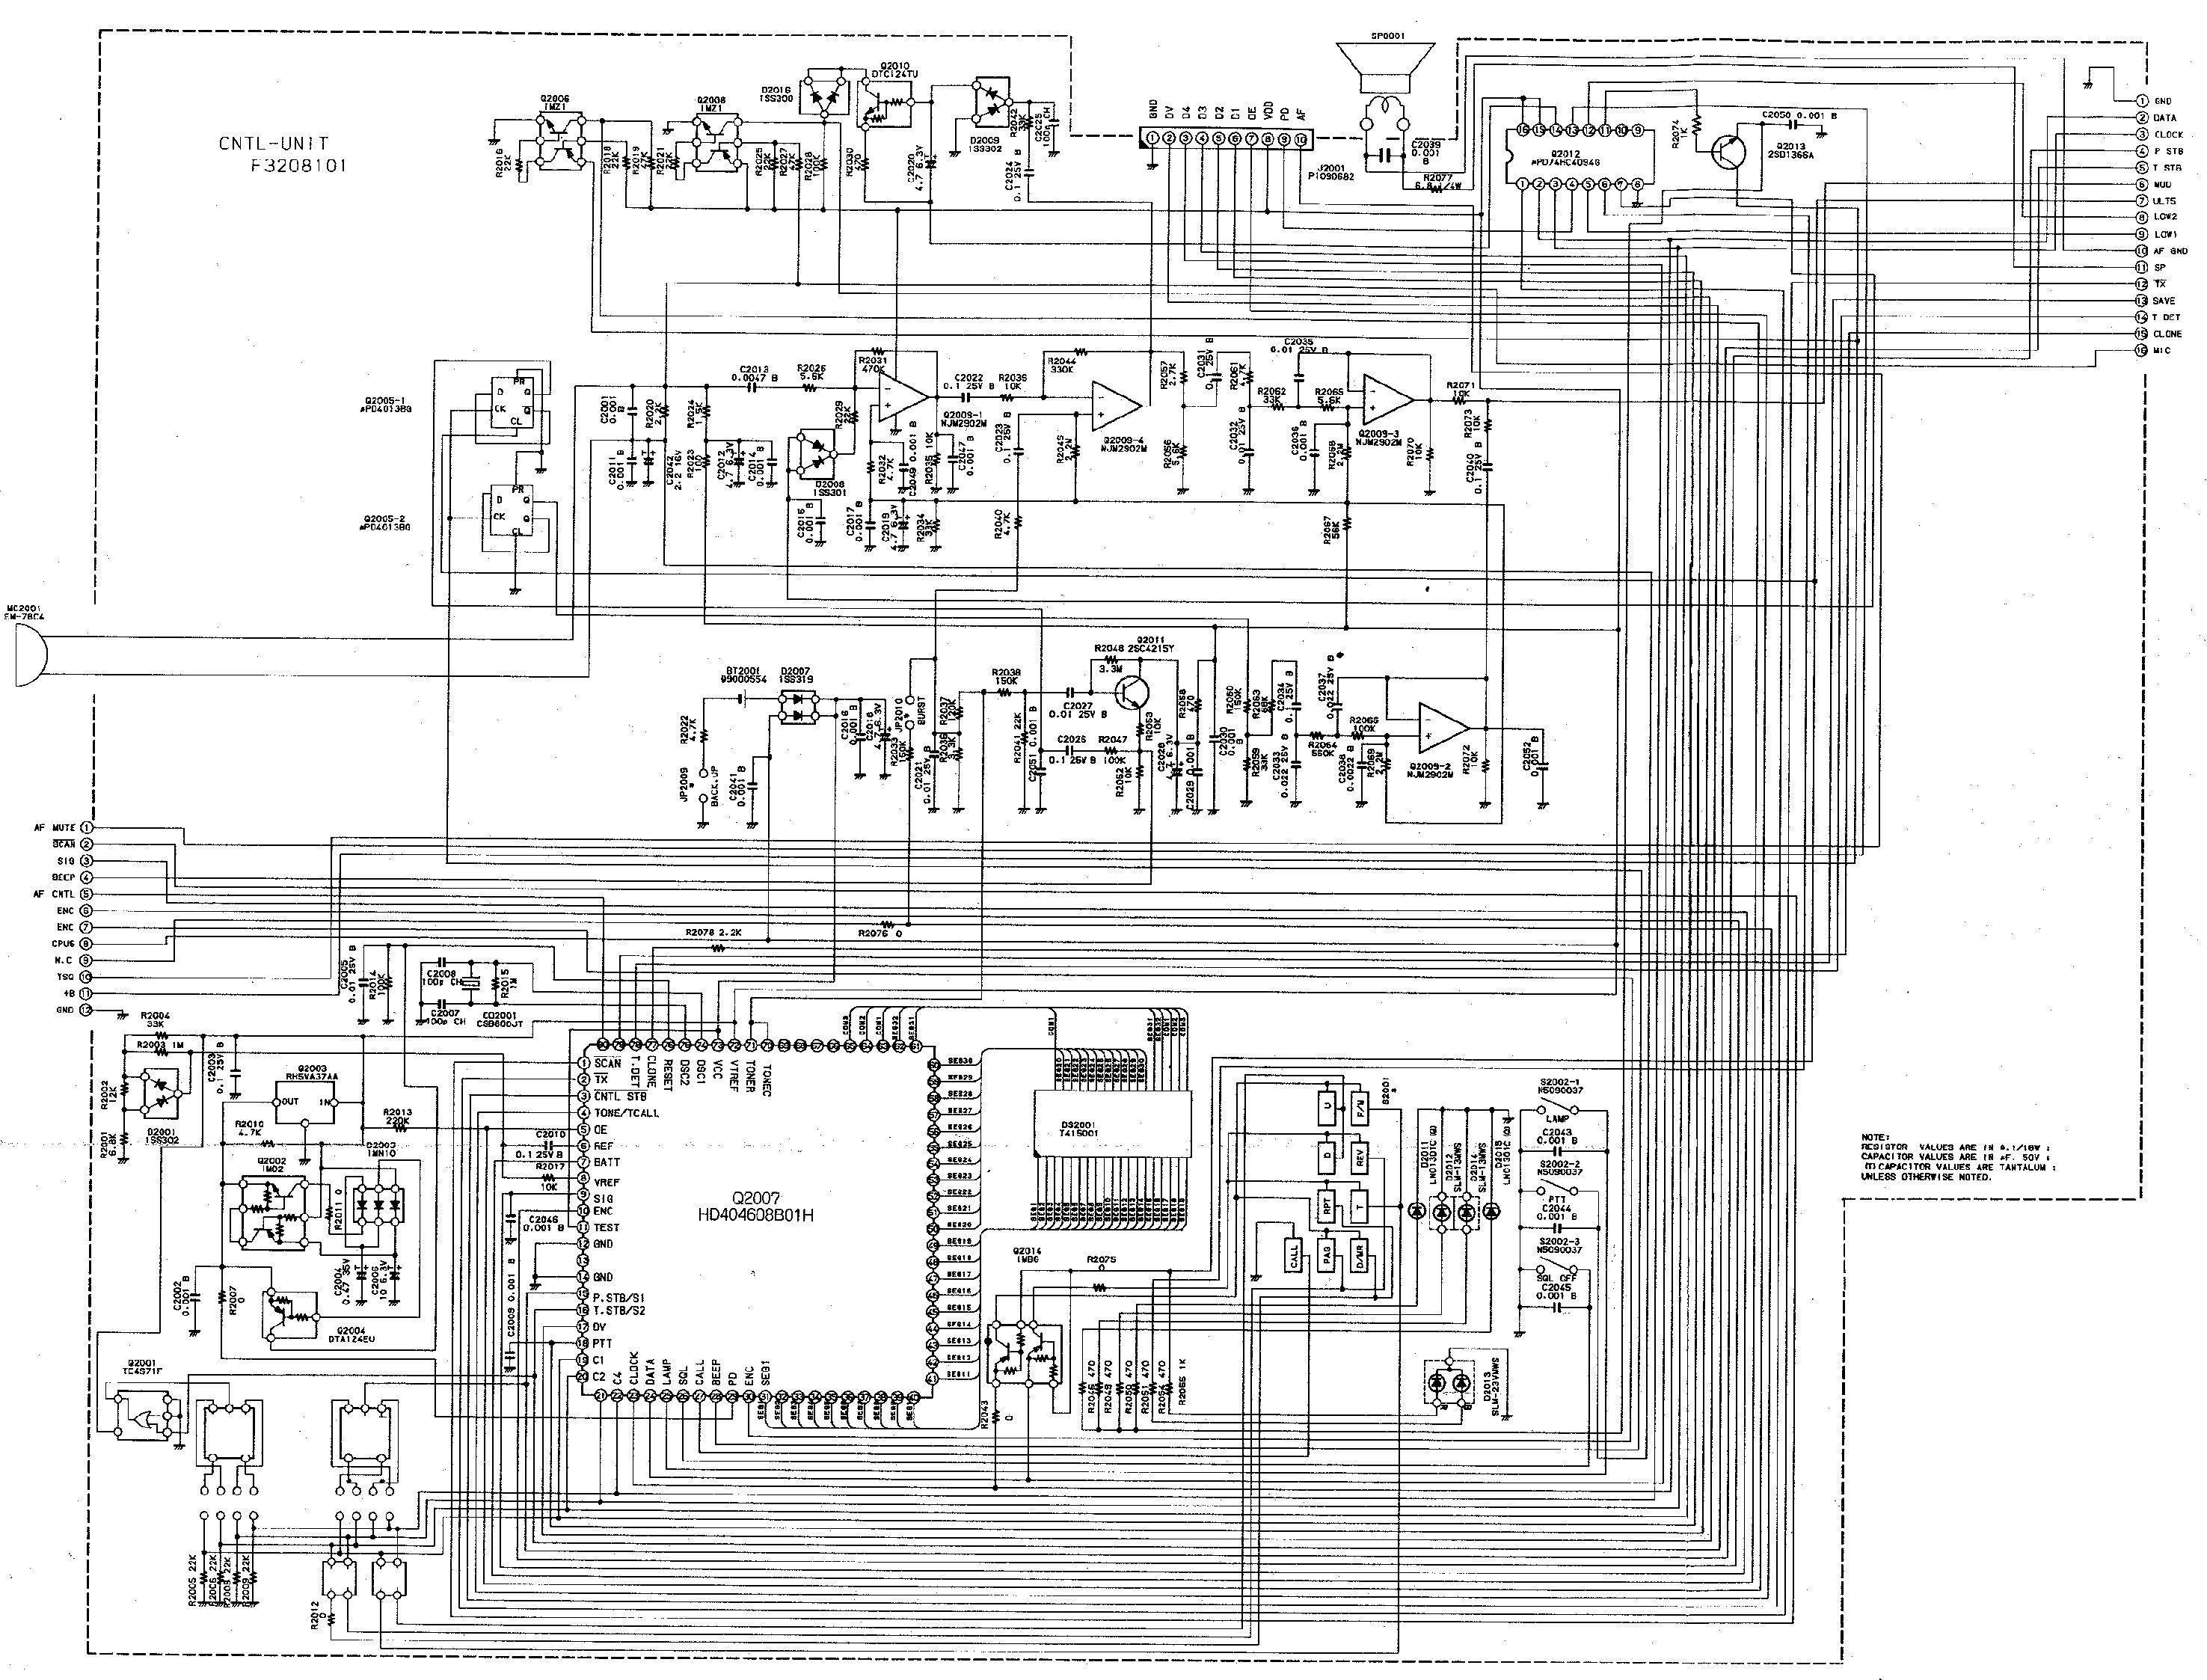 Unique Nikkai Car Stereo Wiring Diagram Diagramsample